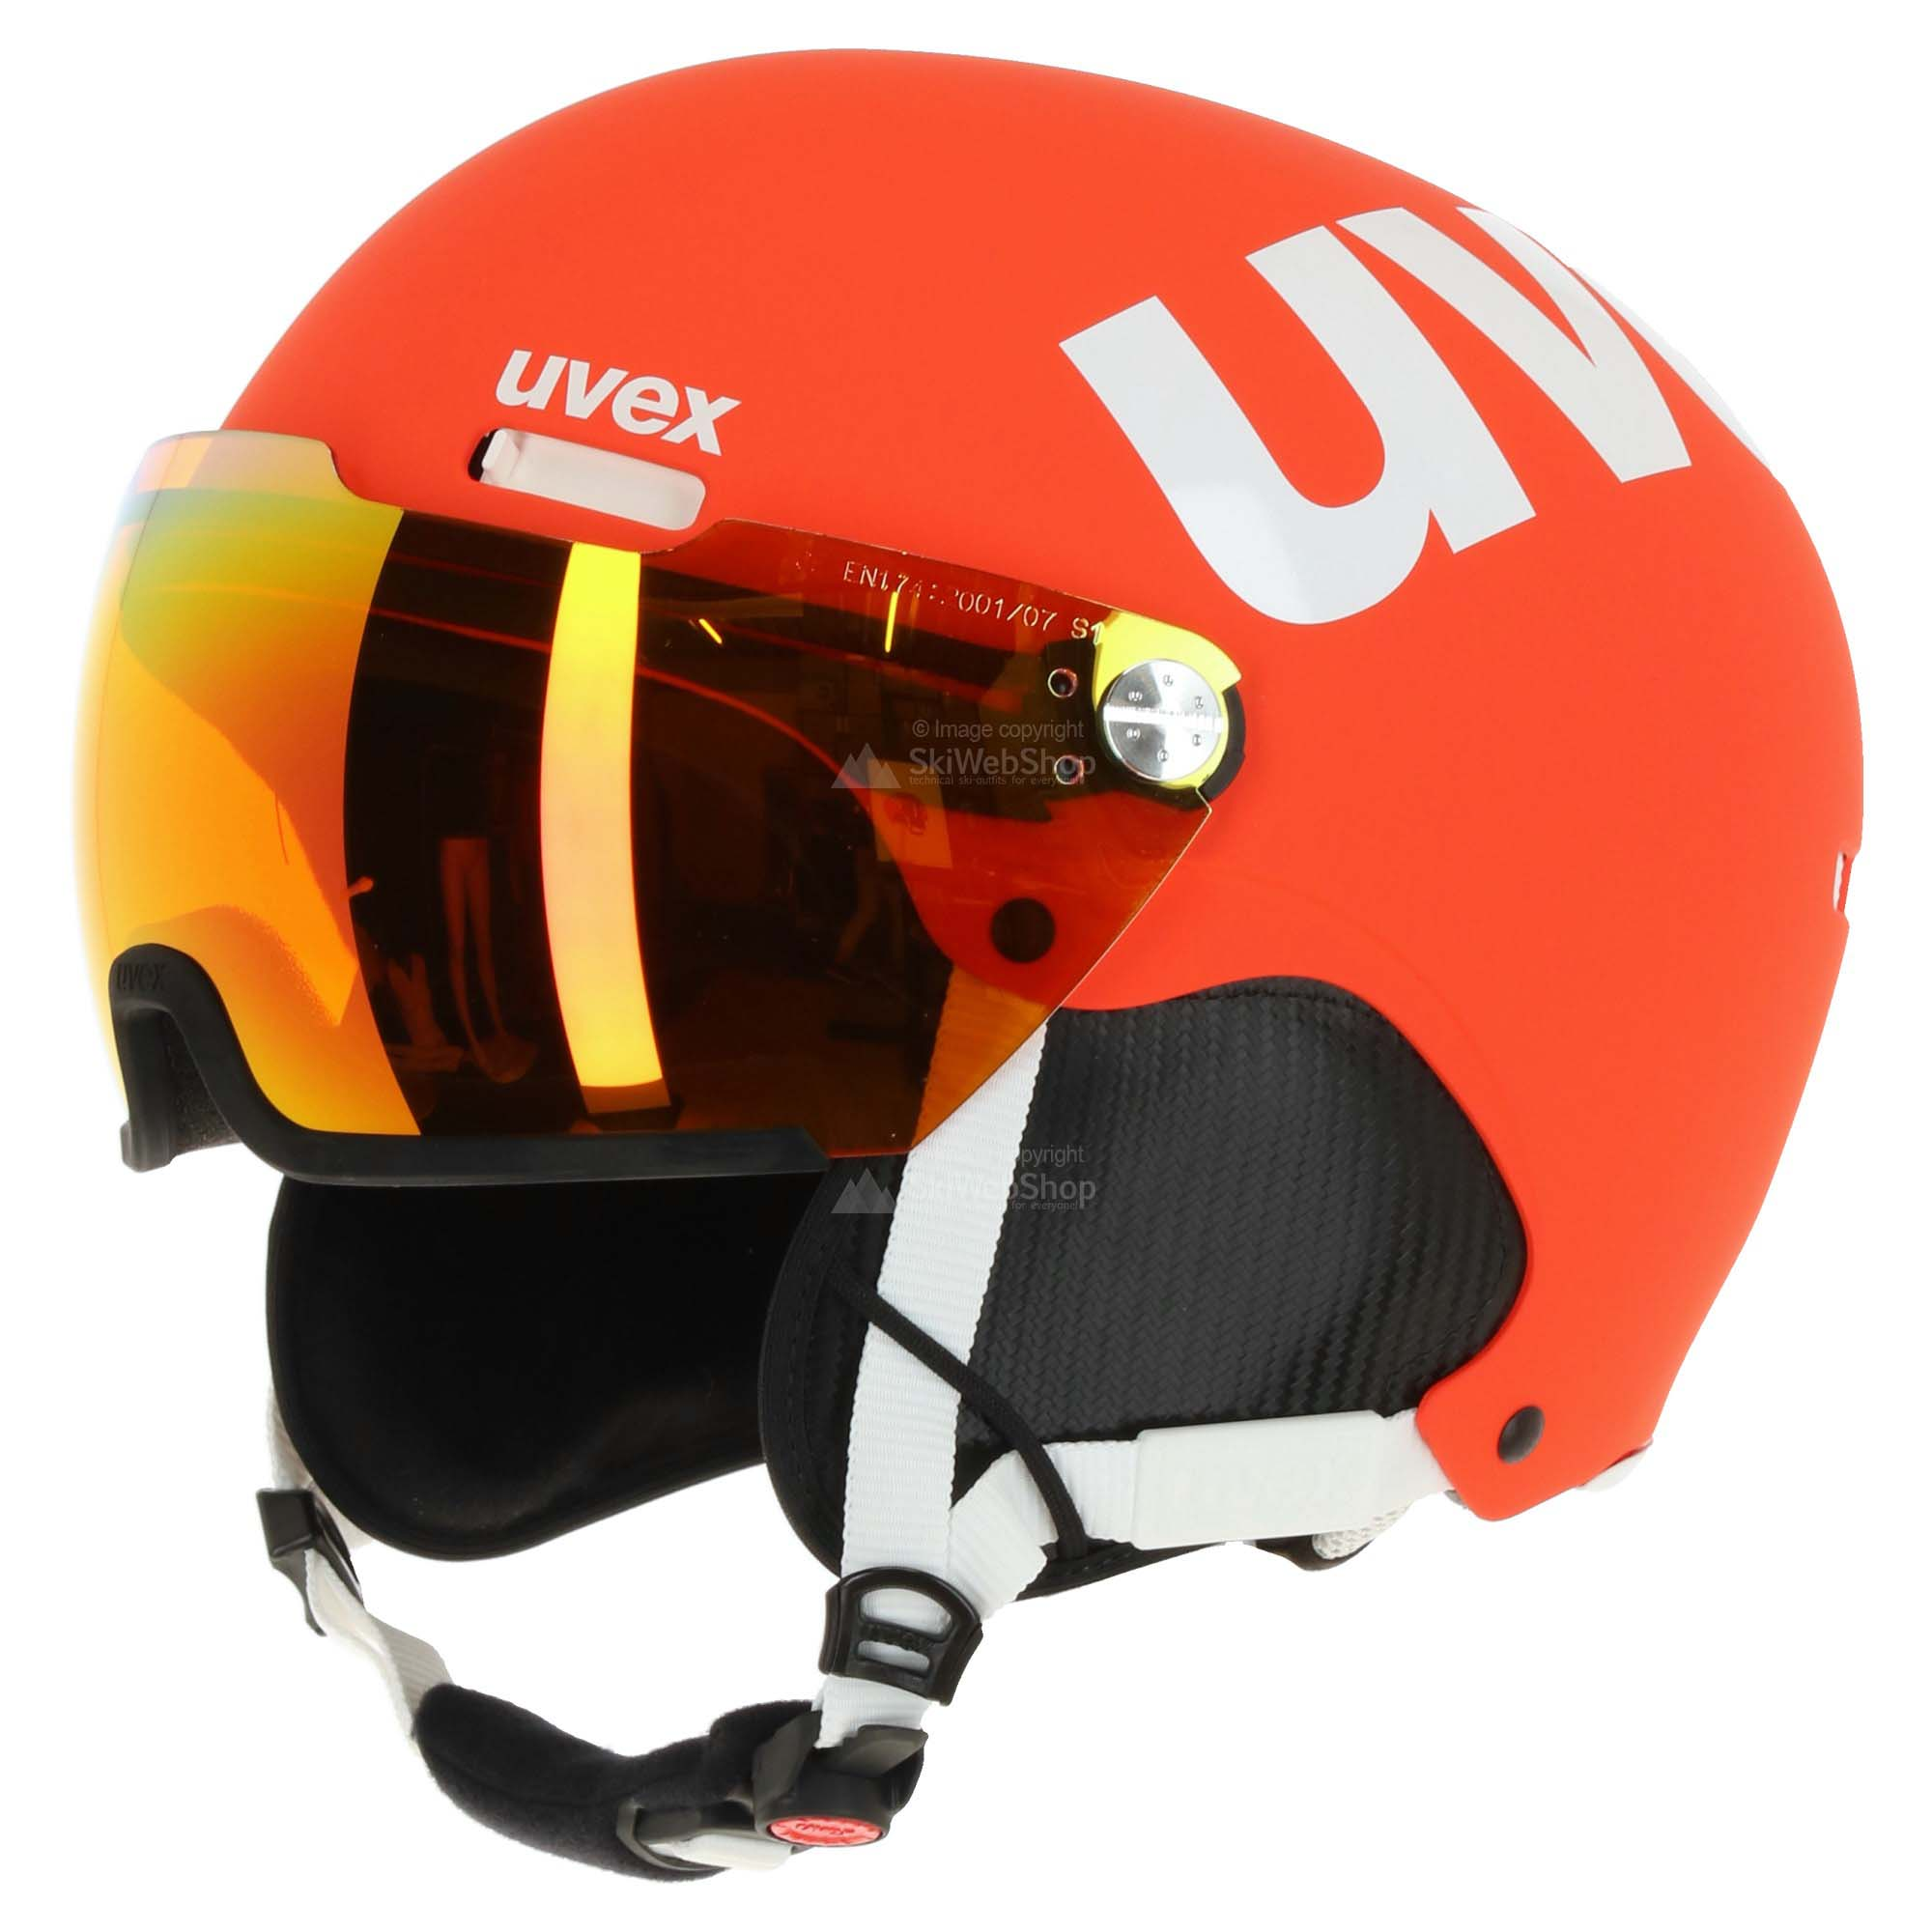 Uvex Hlmt 500 Visor Ski Helmet Matt Orange Skiwebshop Com